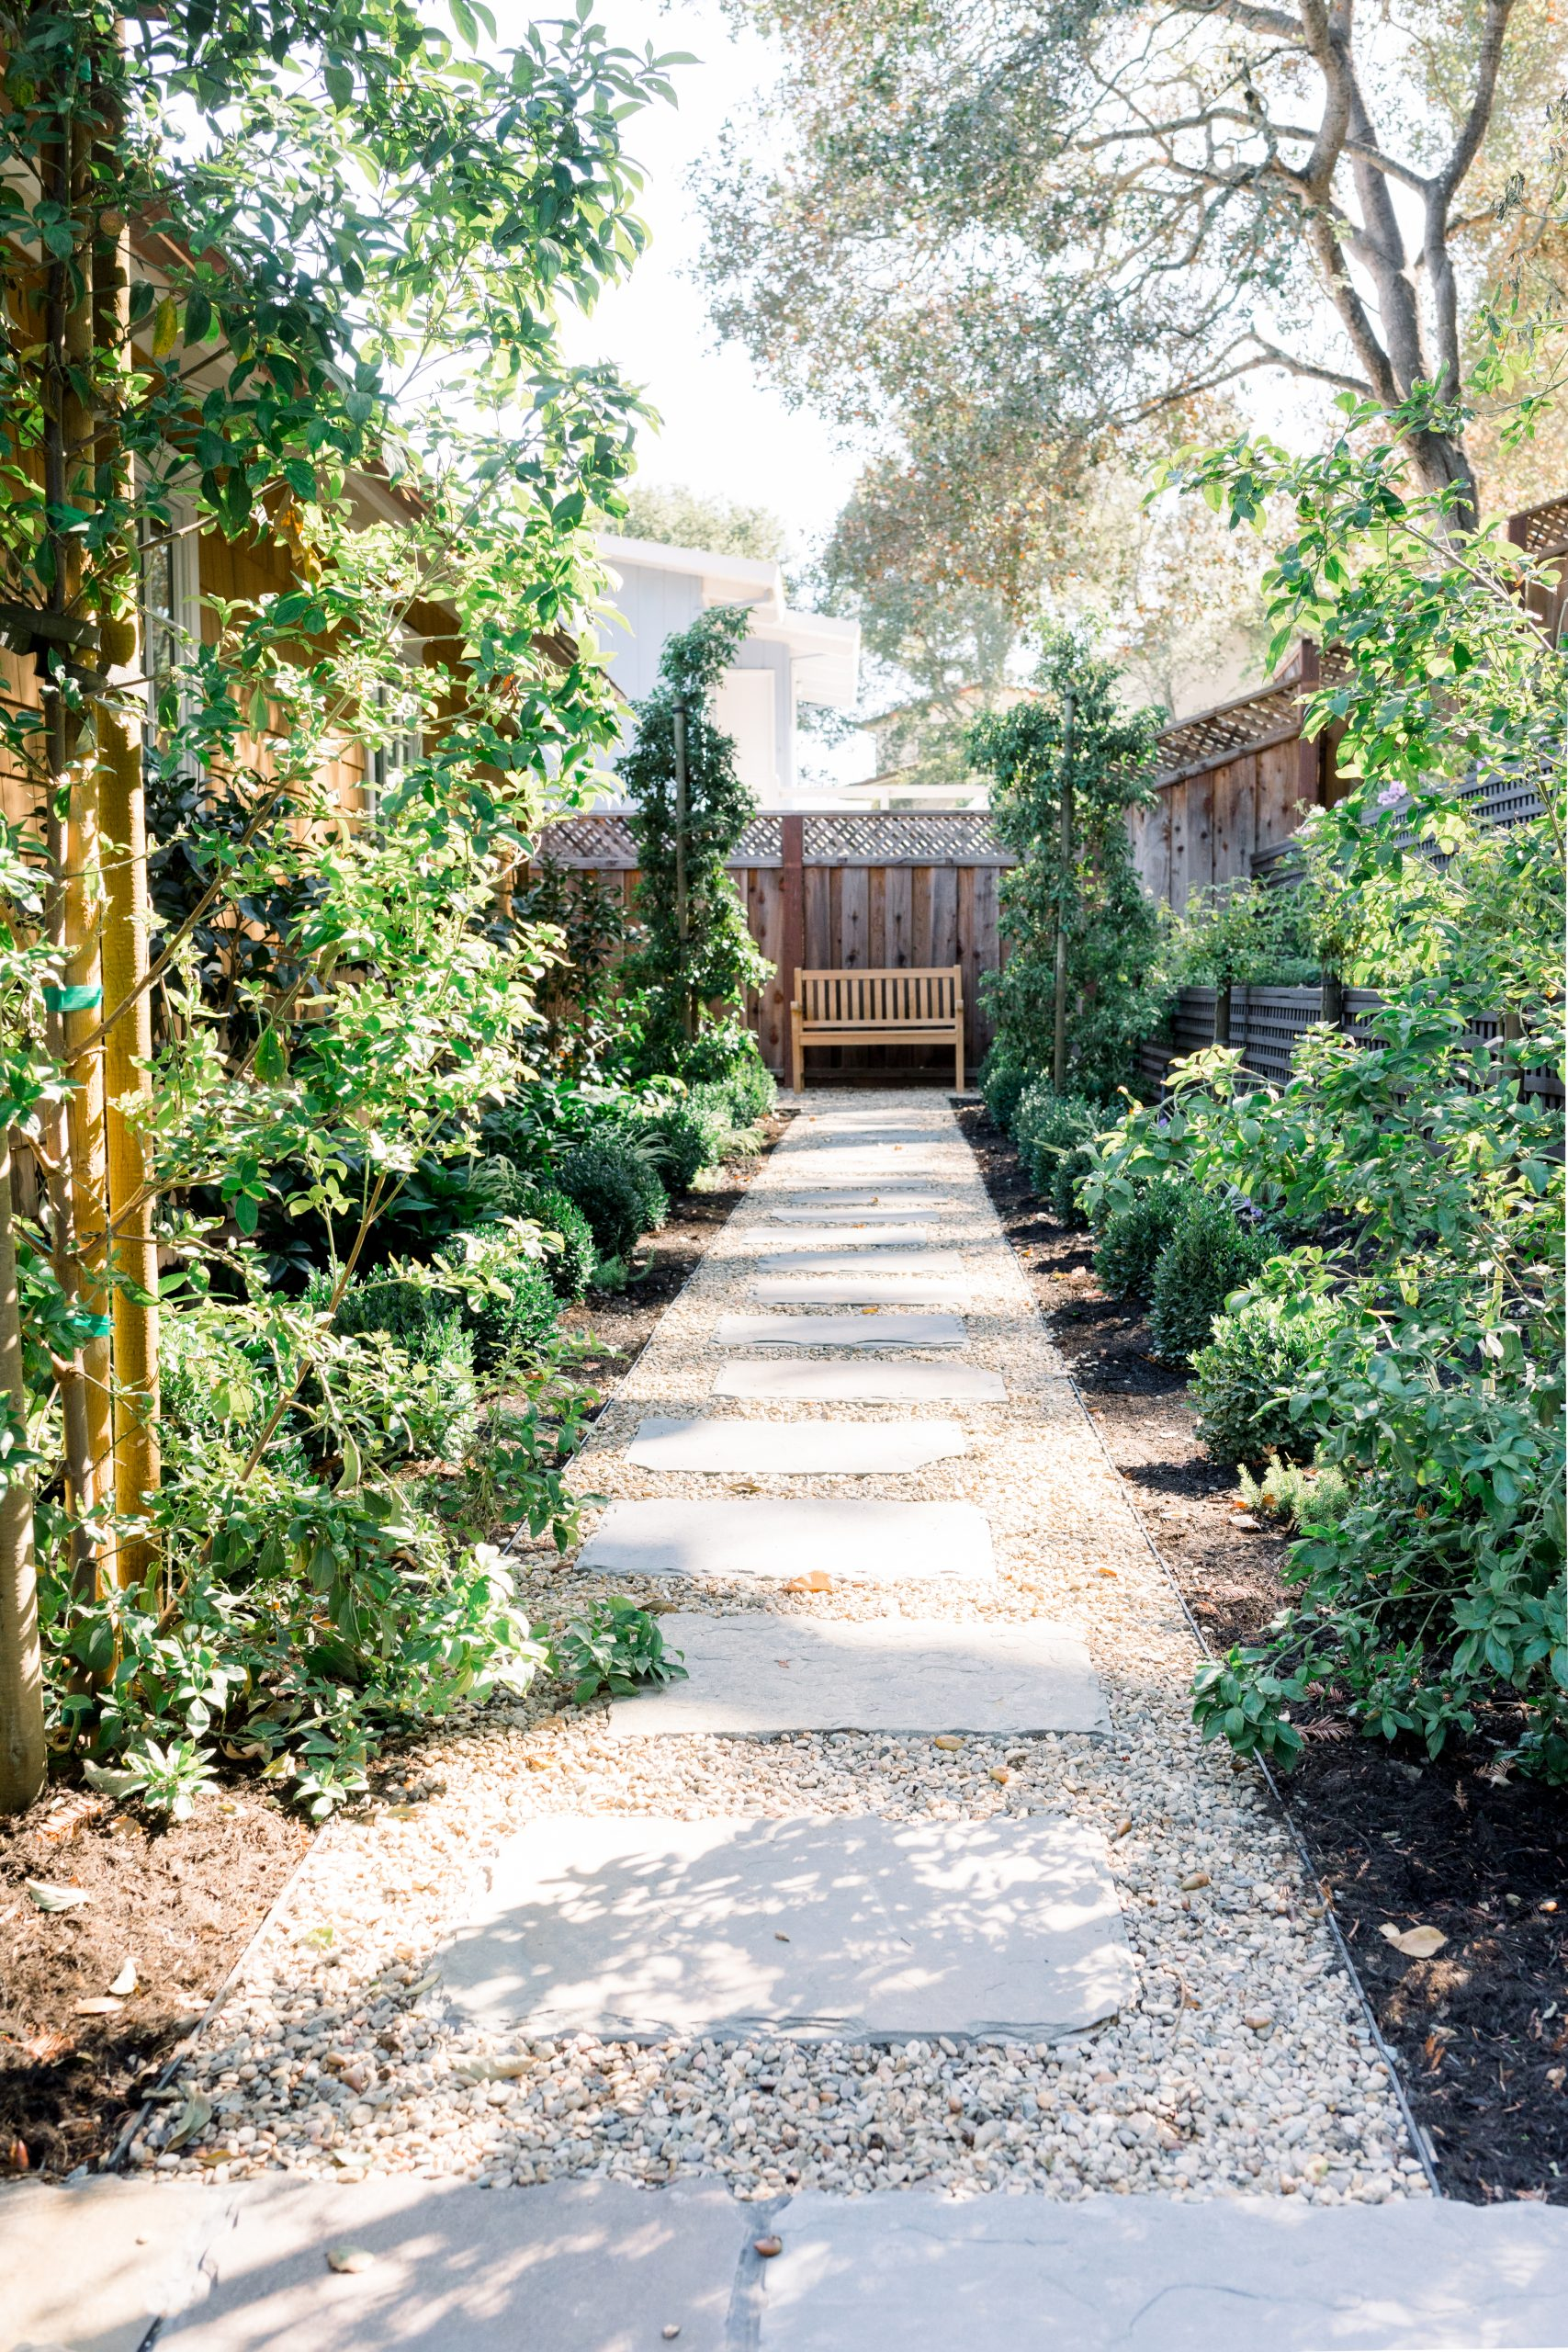 Garden borders and gravel path